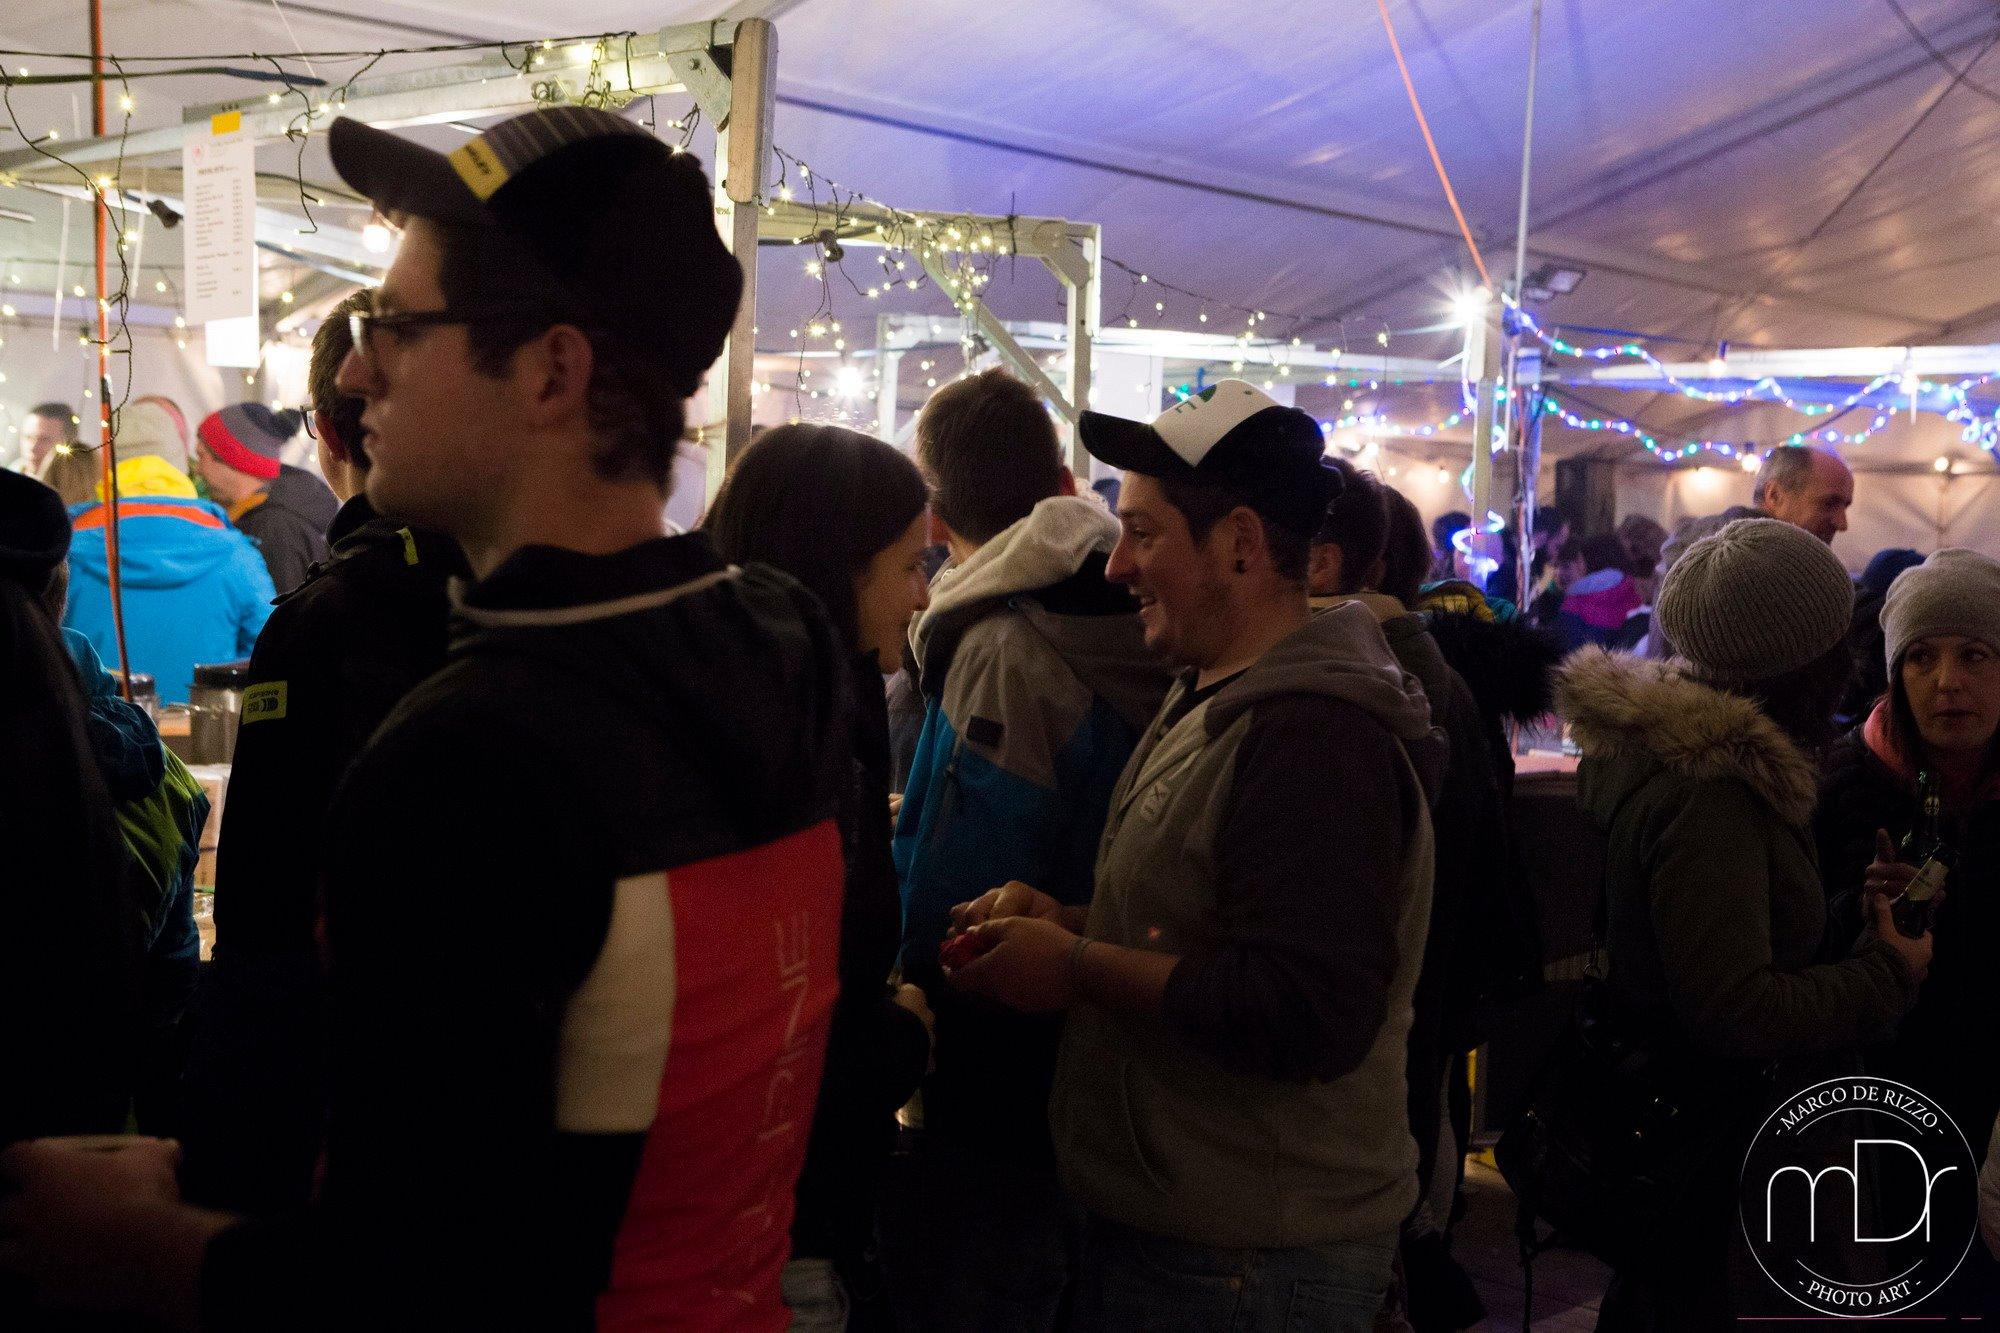 Partyzelt Flicken : W e s t rückblick mig alpine grill bbq